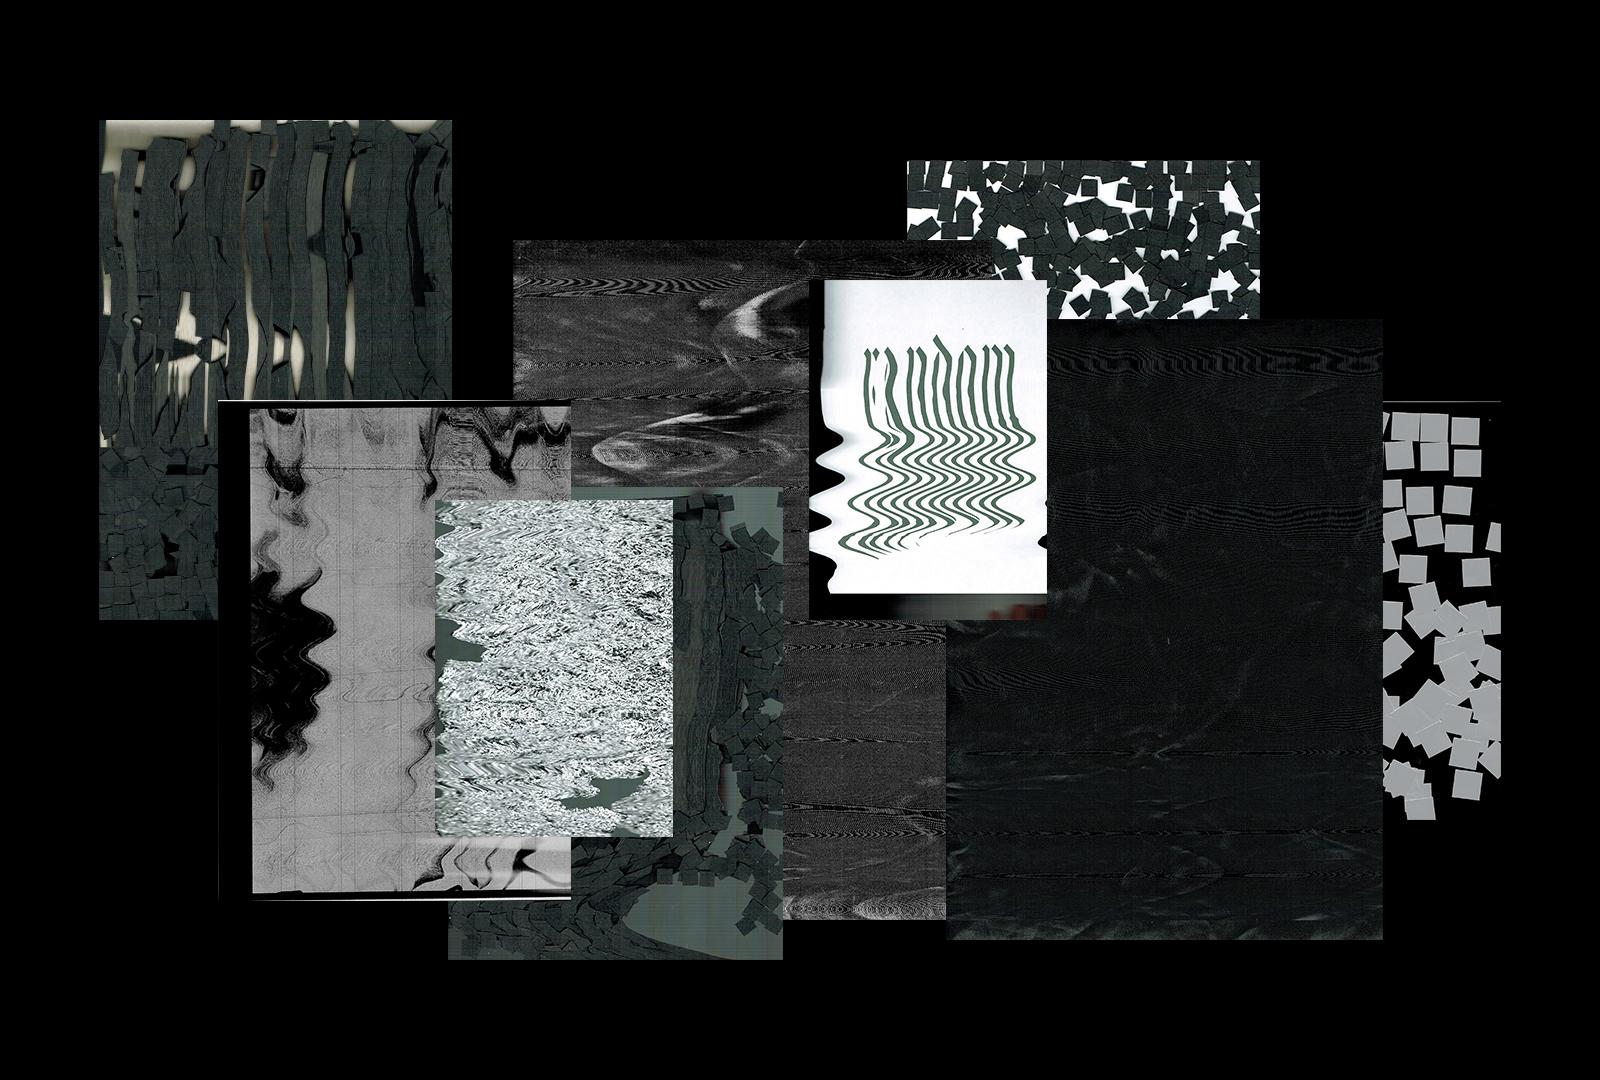 Marcin-Romaniuk-Random-Gallery-3-Scans